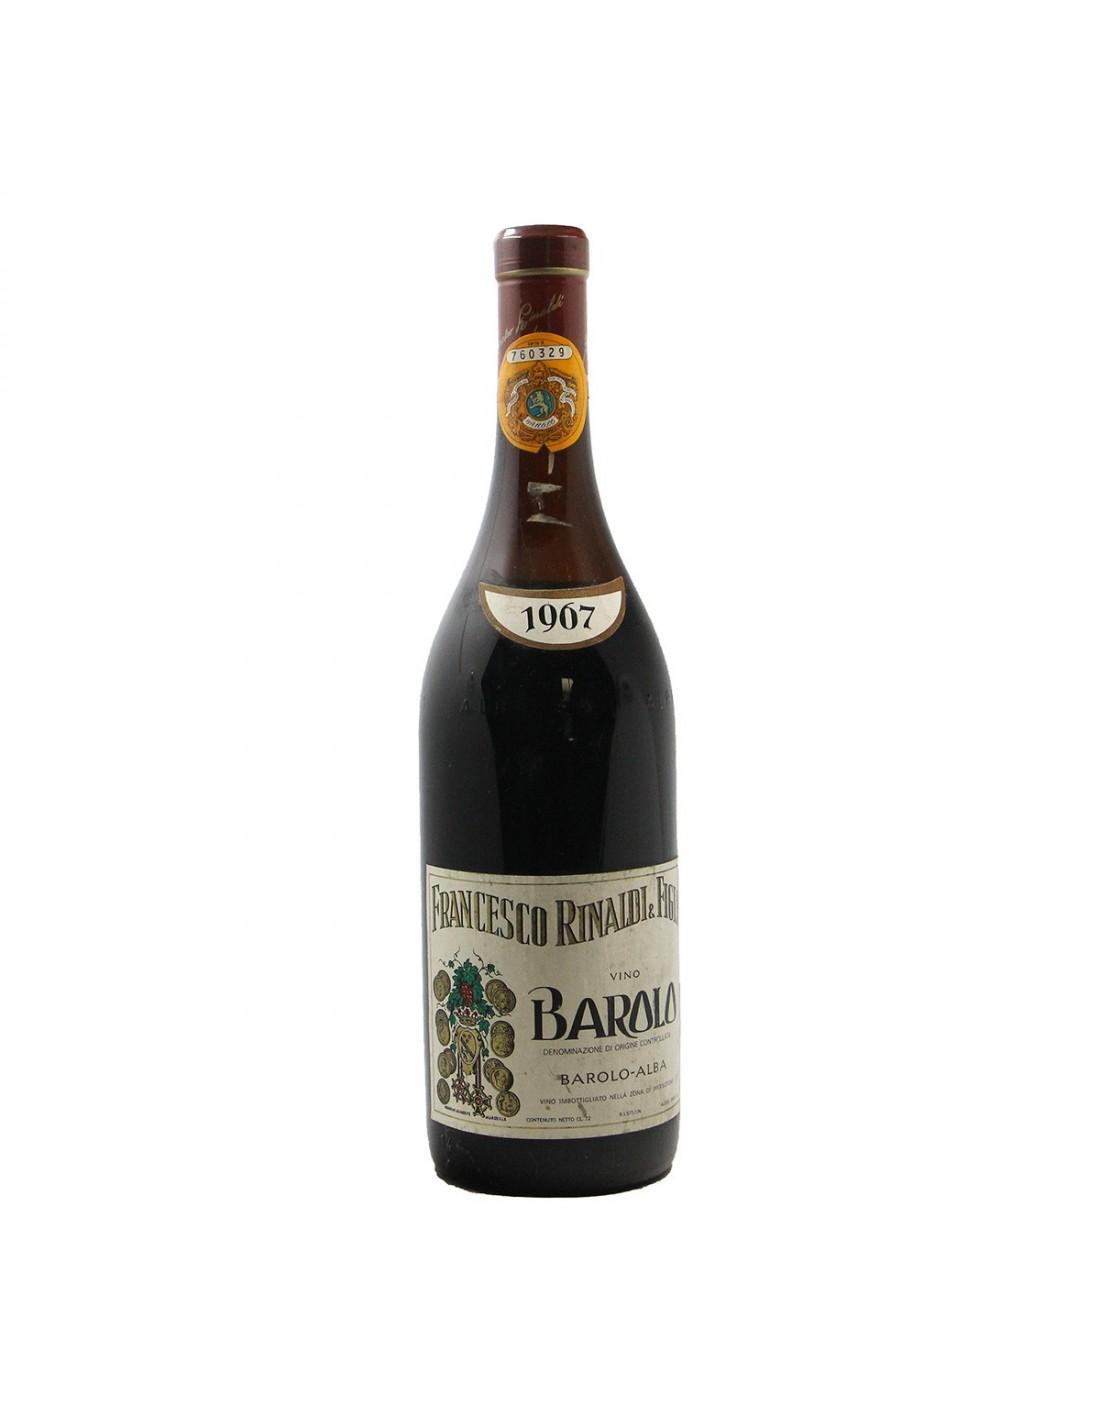 BAROLO LOW LEVEL 1967 RINALDI FRANCESCO GRANDI BOTTIGLIE